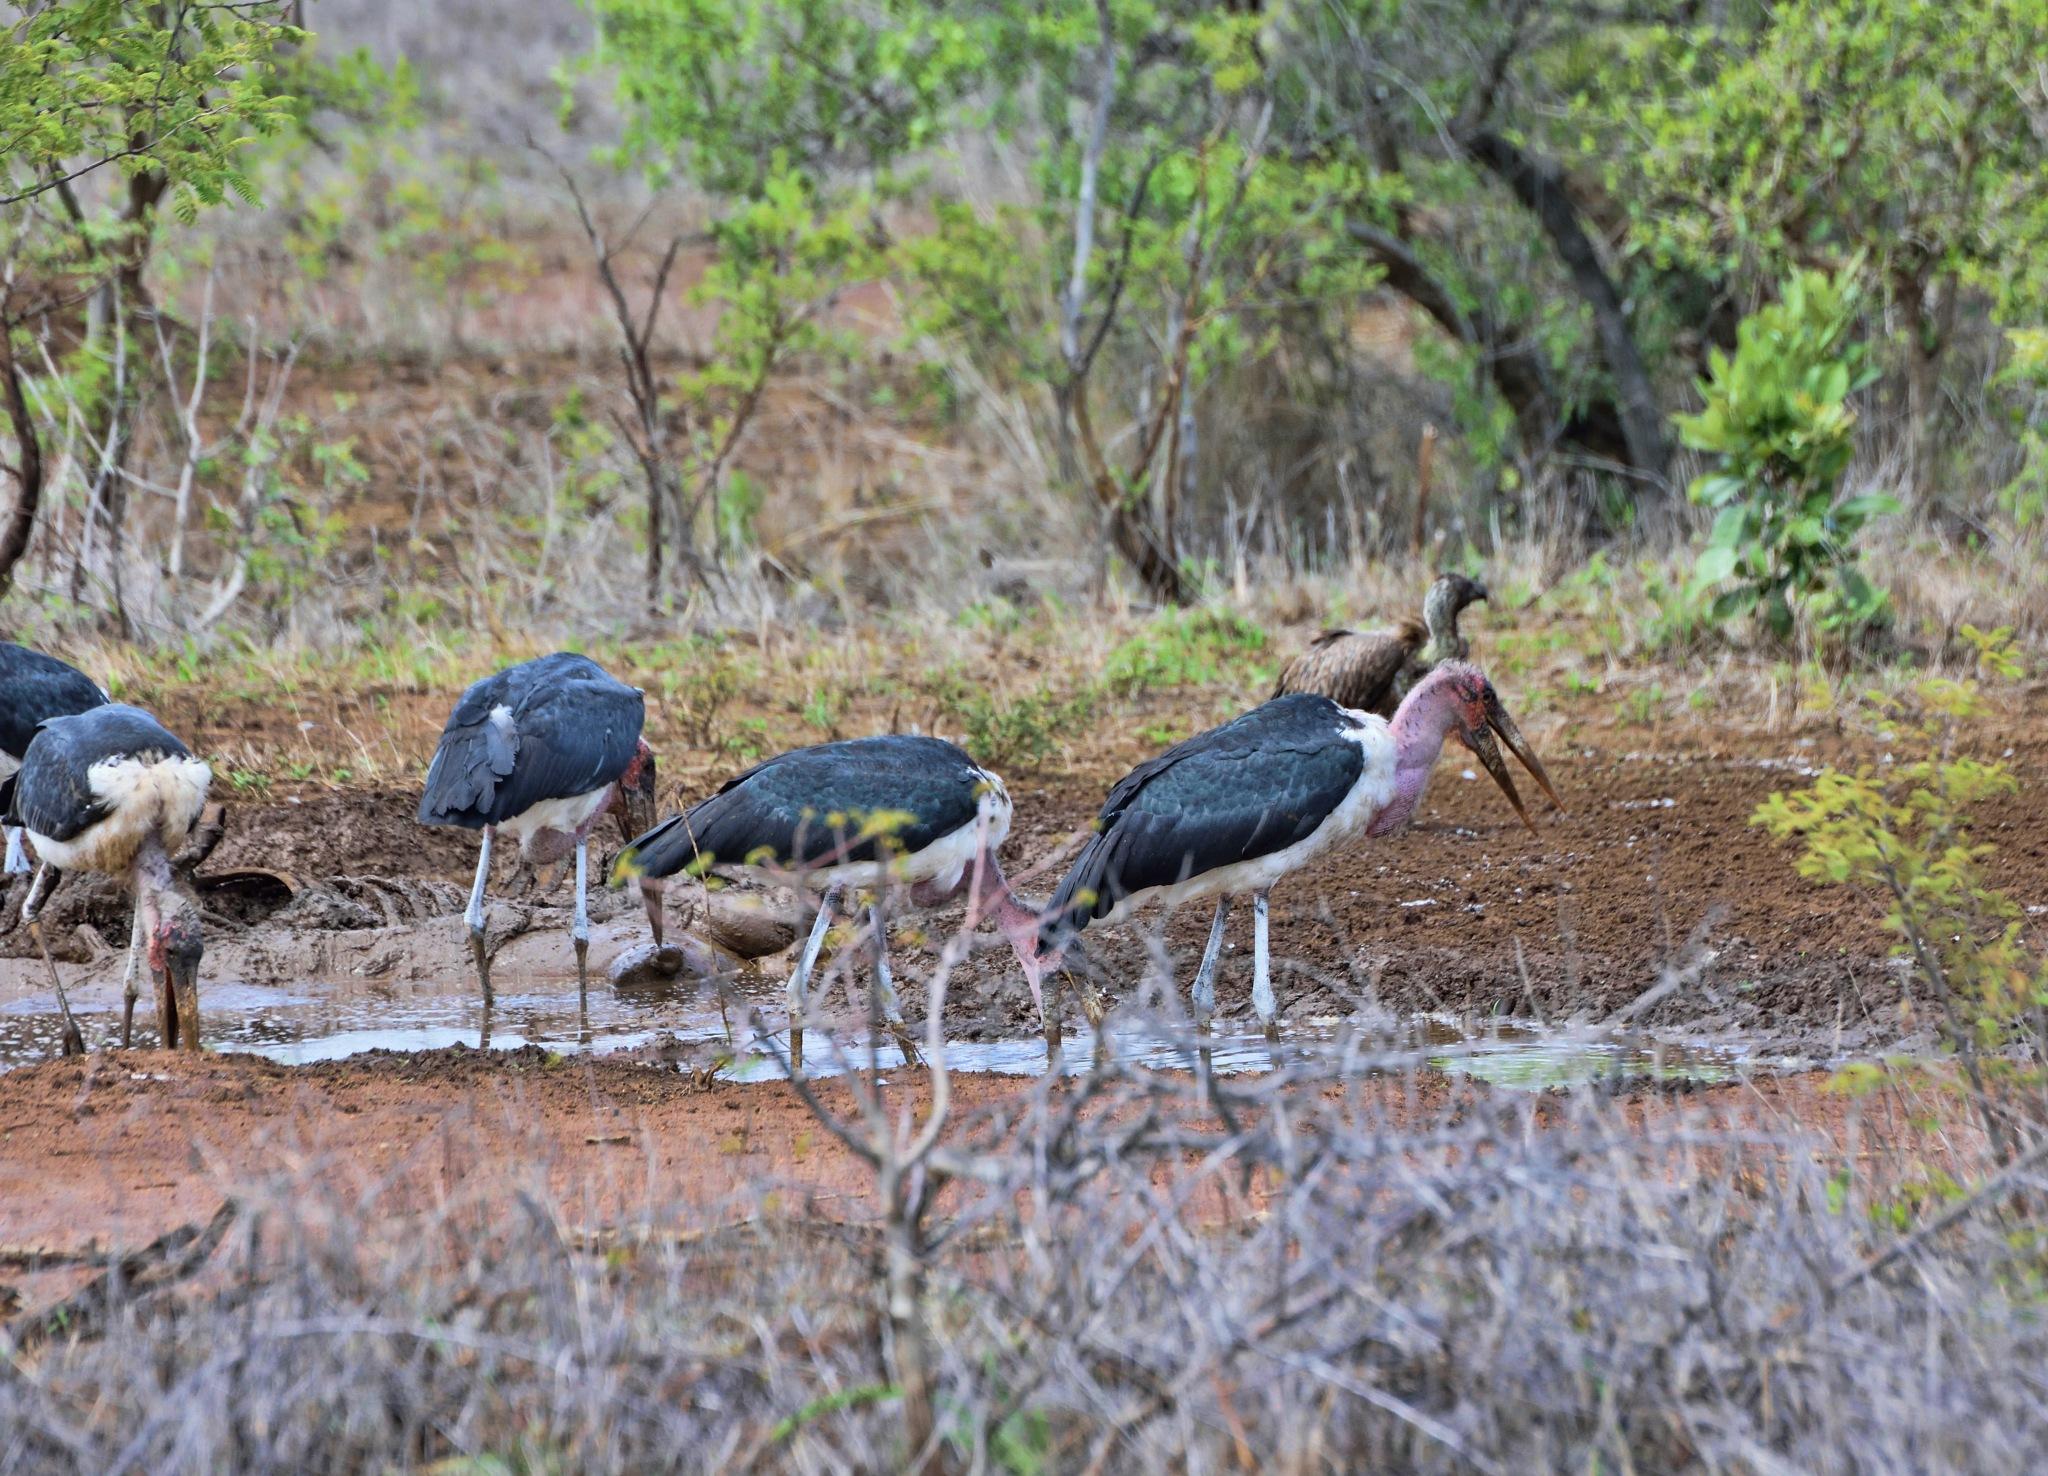 South Africa - Kruger Park (159) Marabou Storks and a White Backed Vulture by Derek Clarke